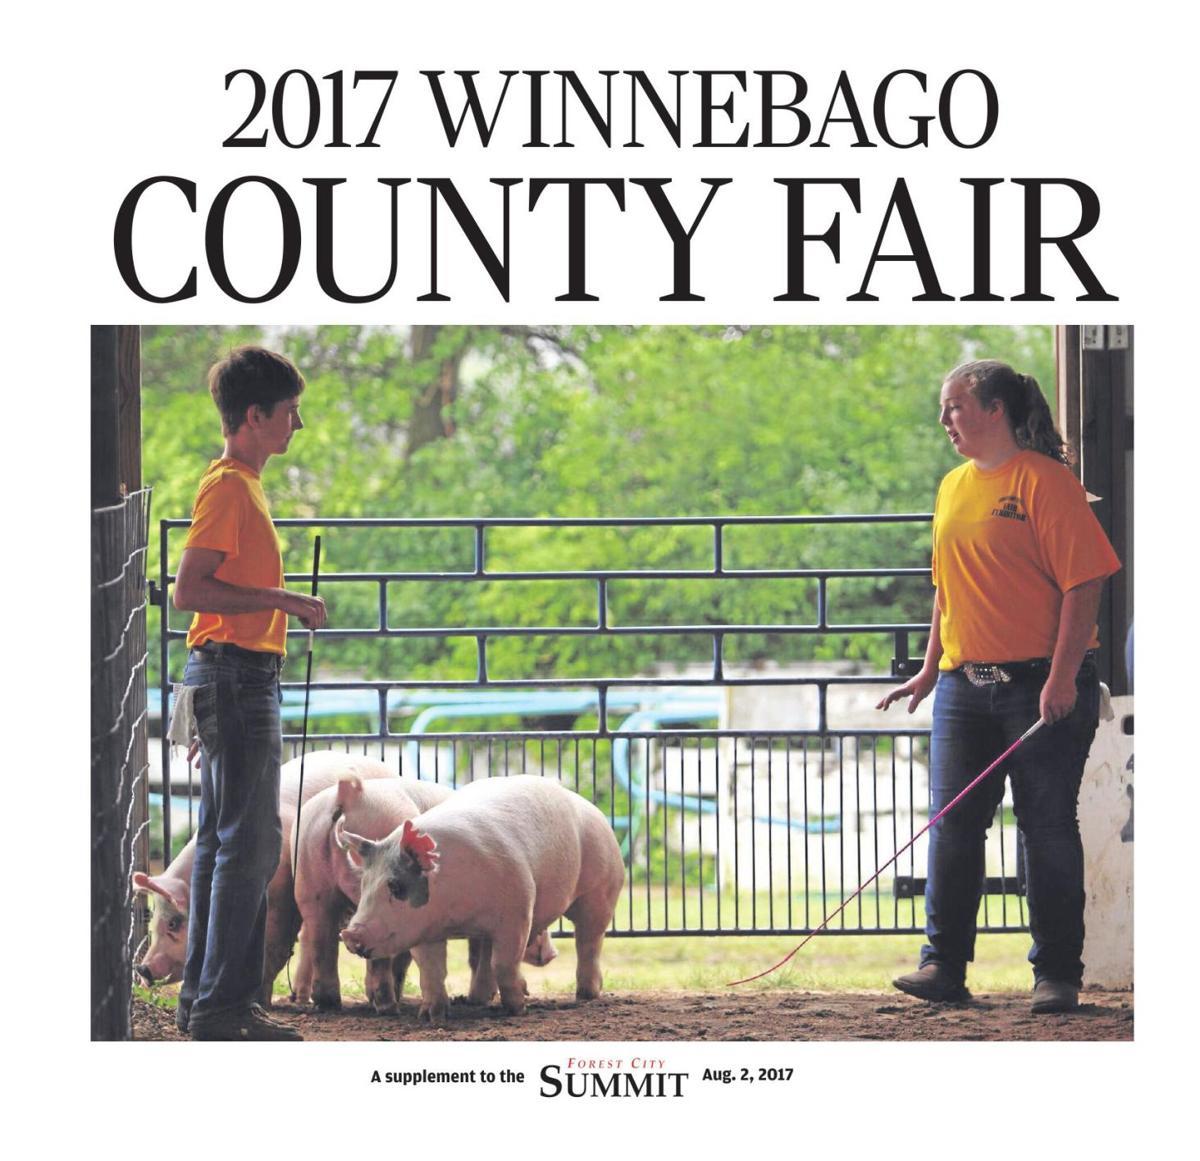 2017 Winnebago County Fair